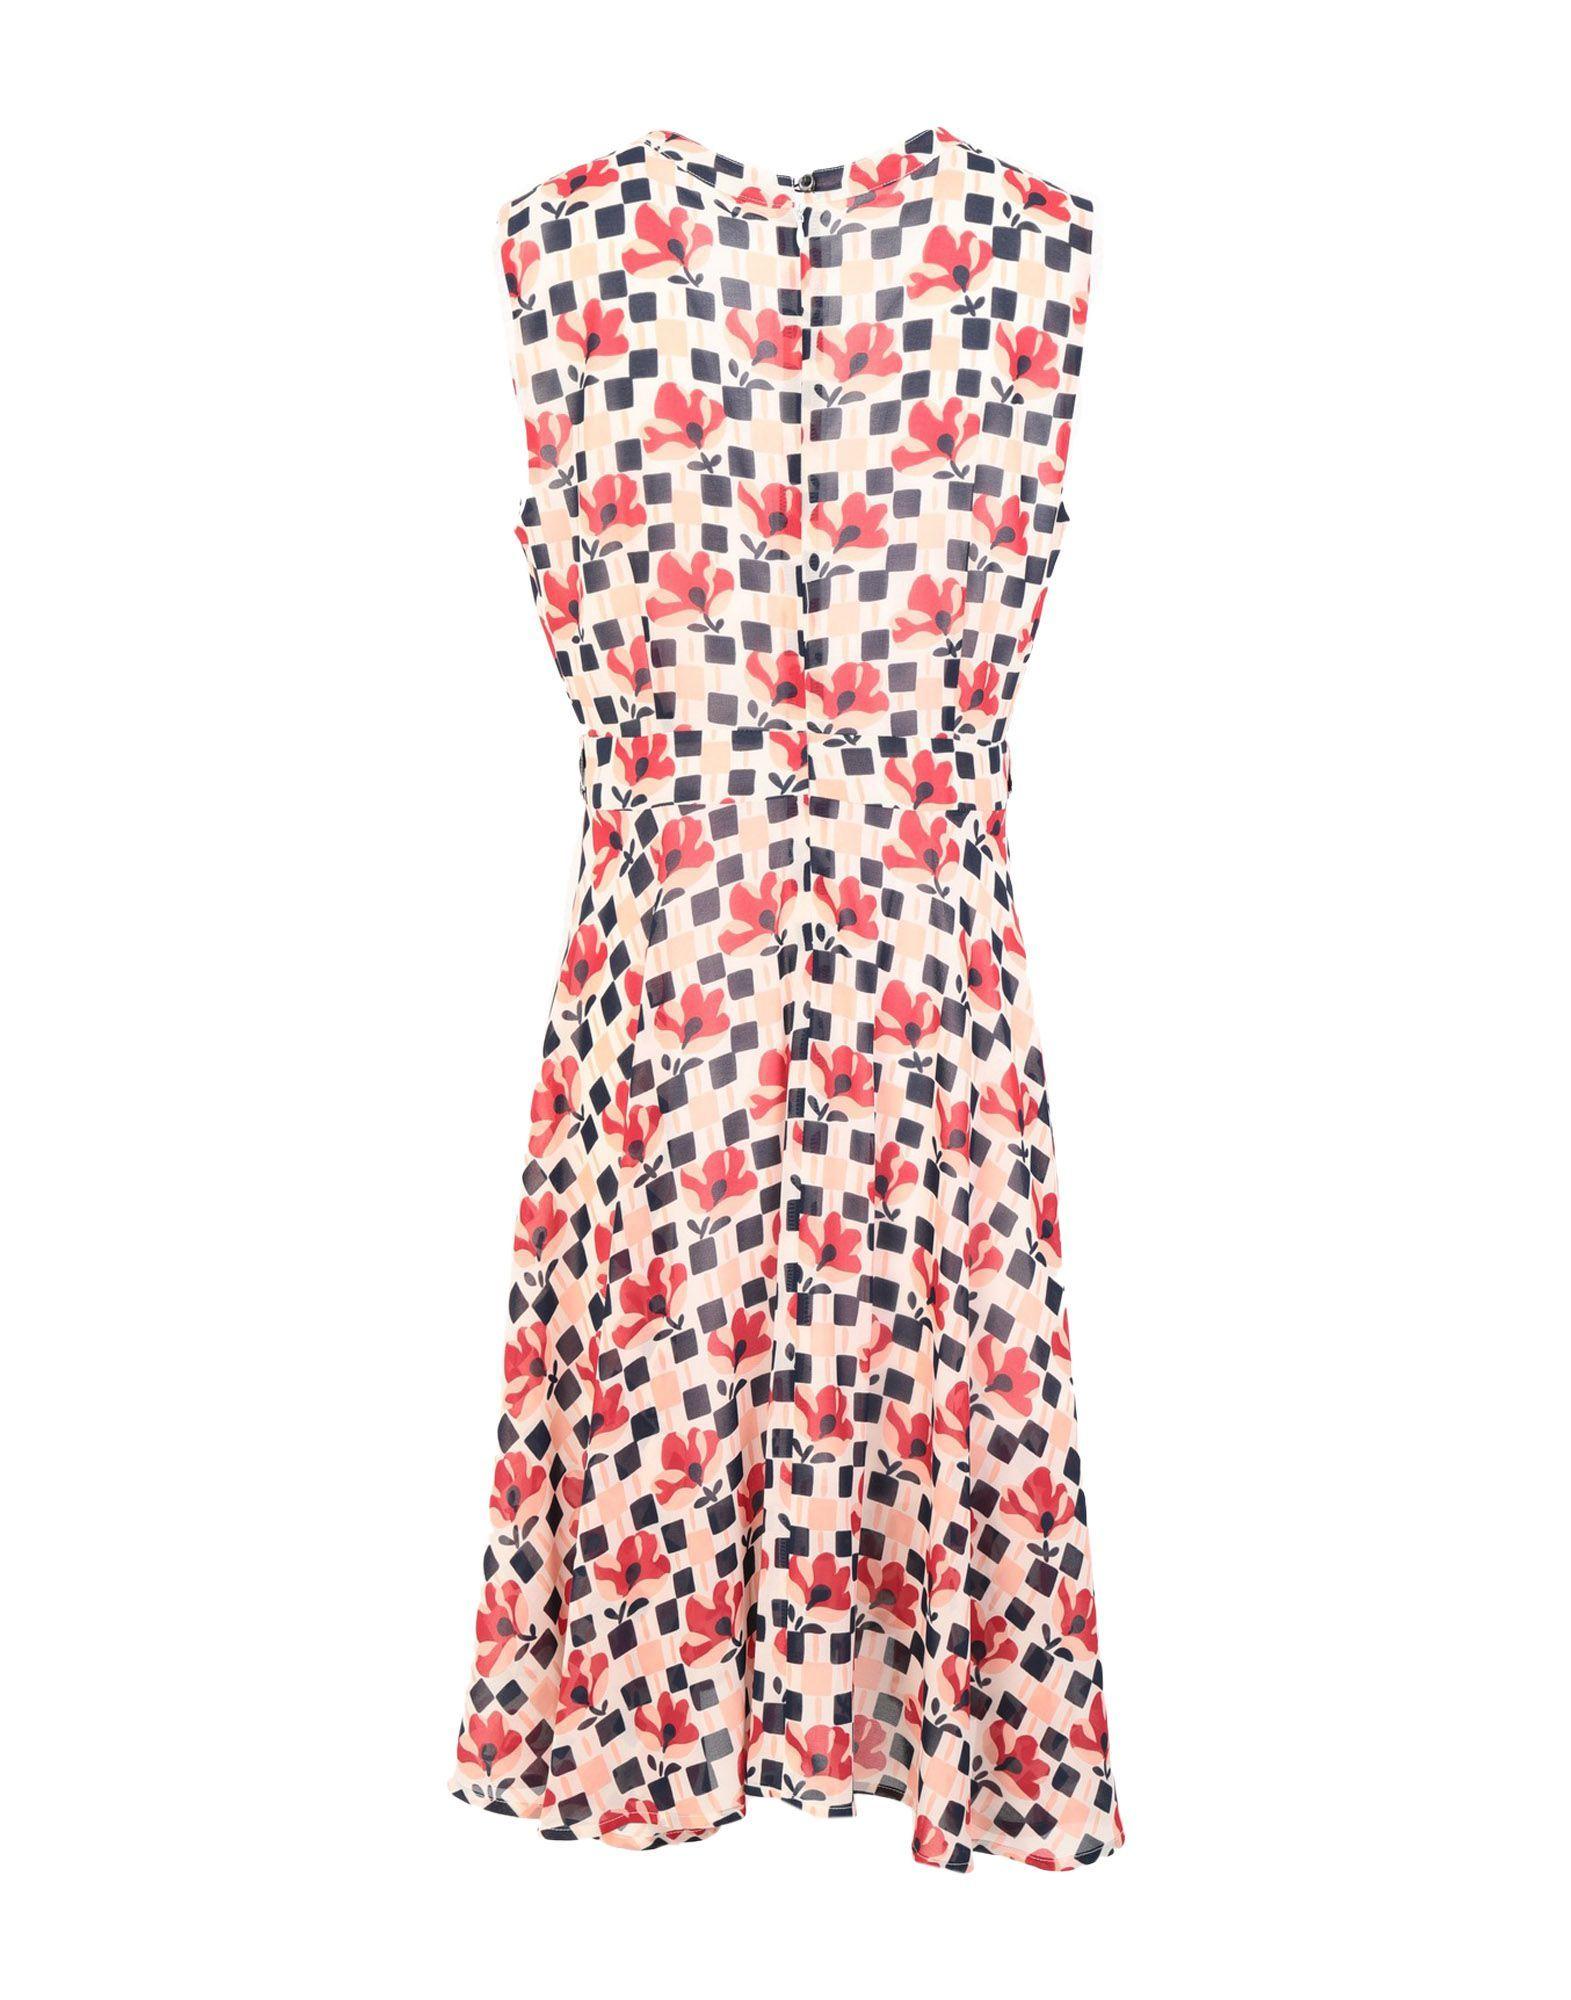 Anonyme Designers Pink Print Dress